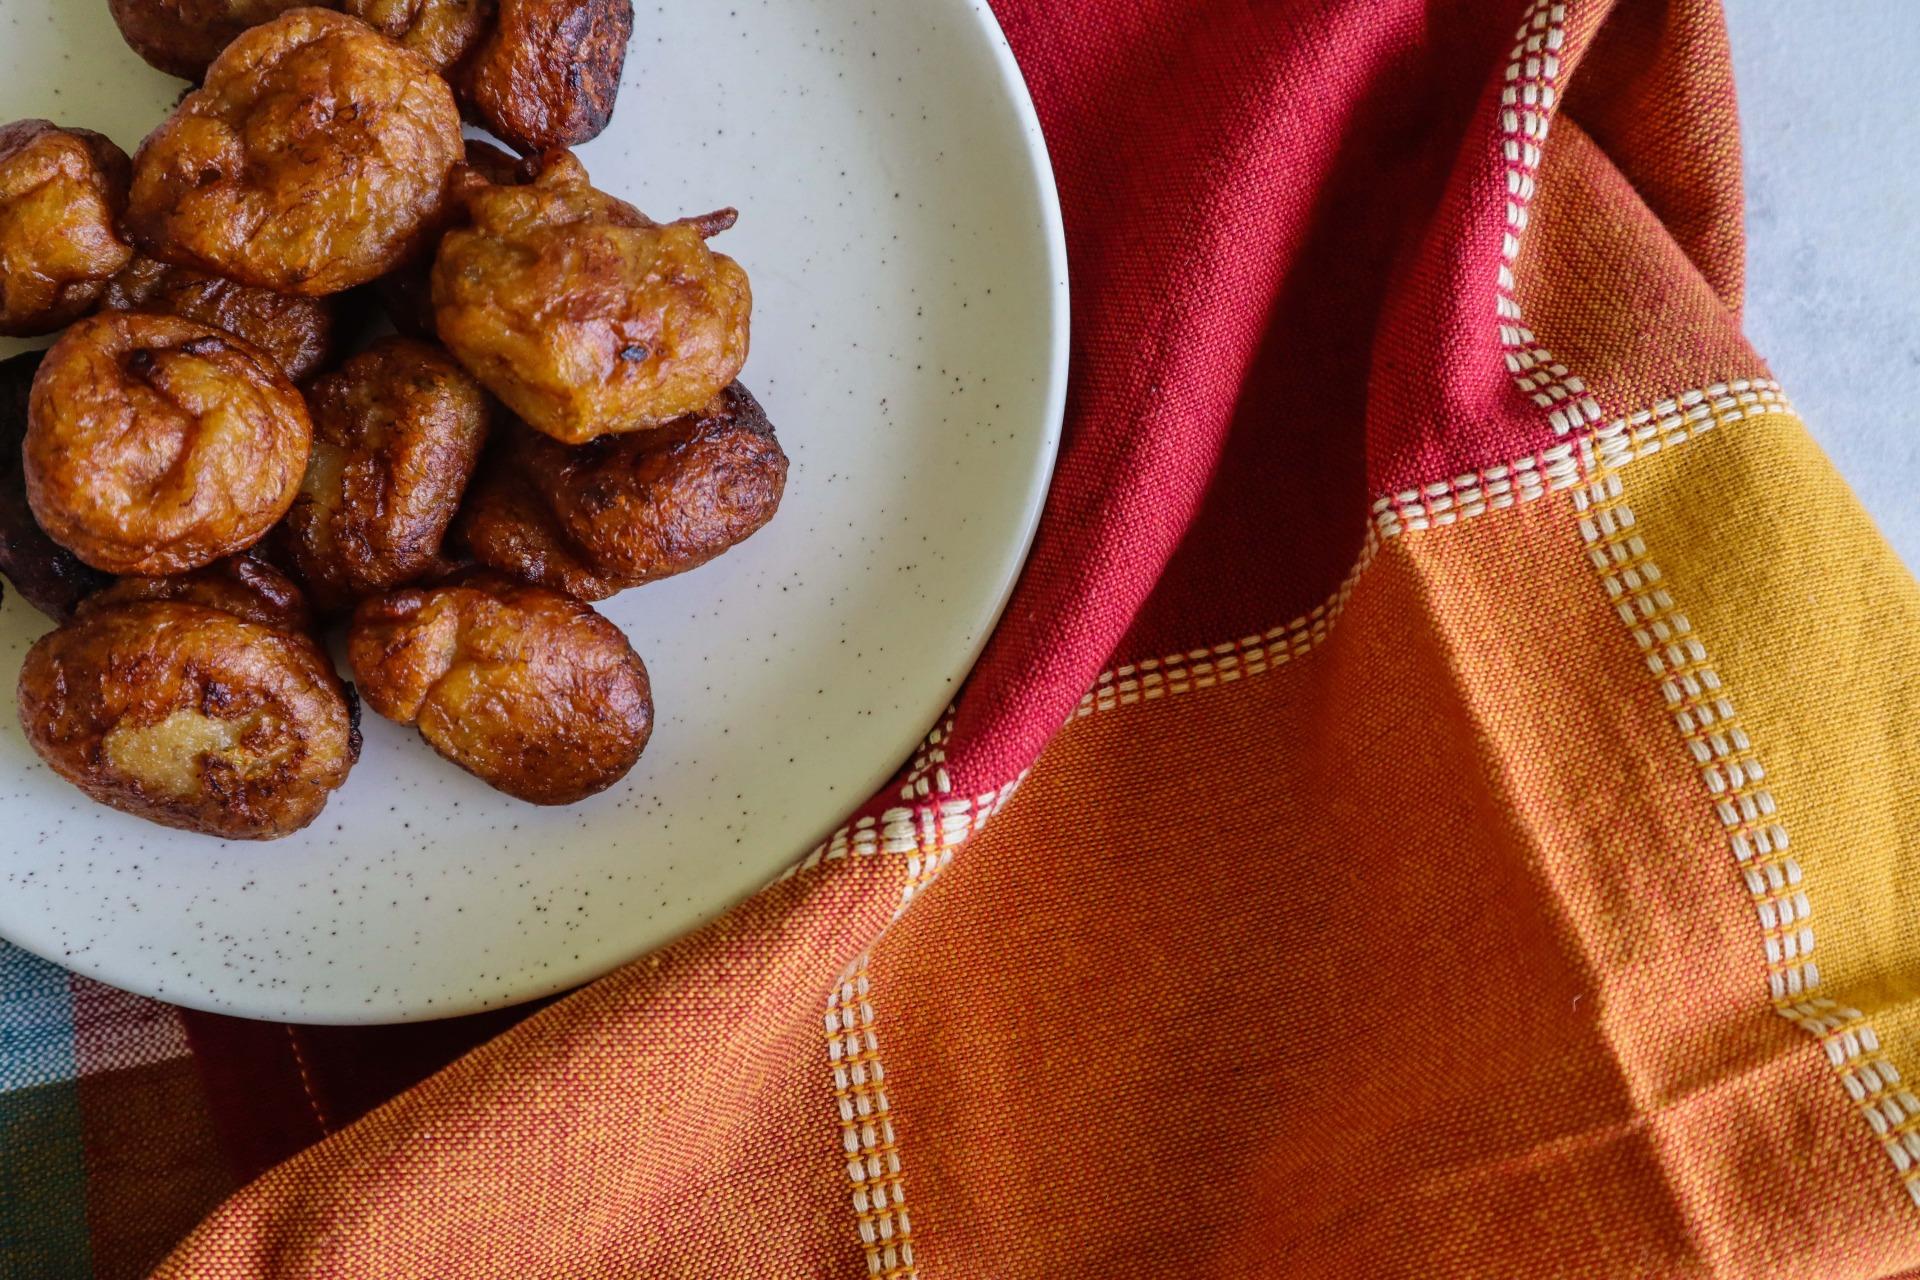 fromthecornertable, bananafritters, kola boda, bengali kola boda, overripe banana recipe